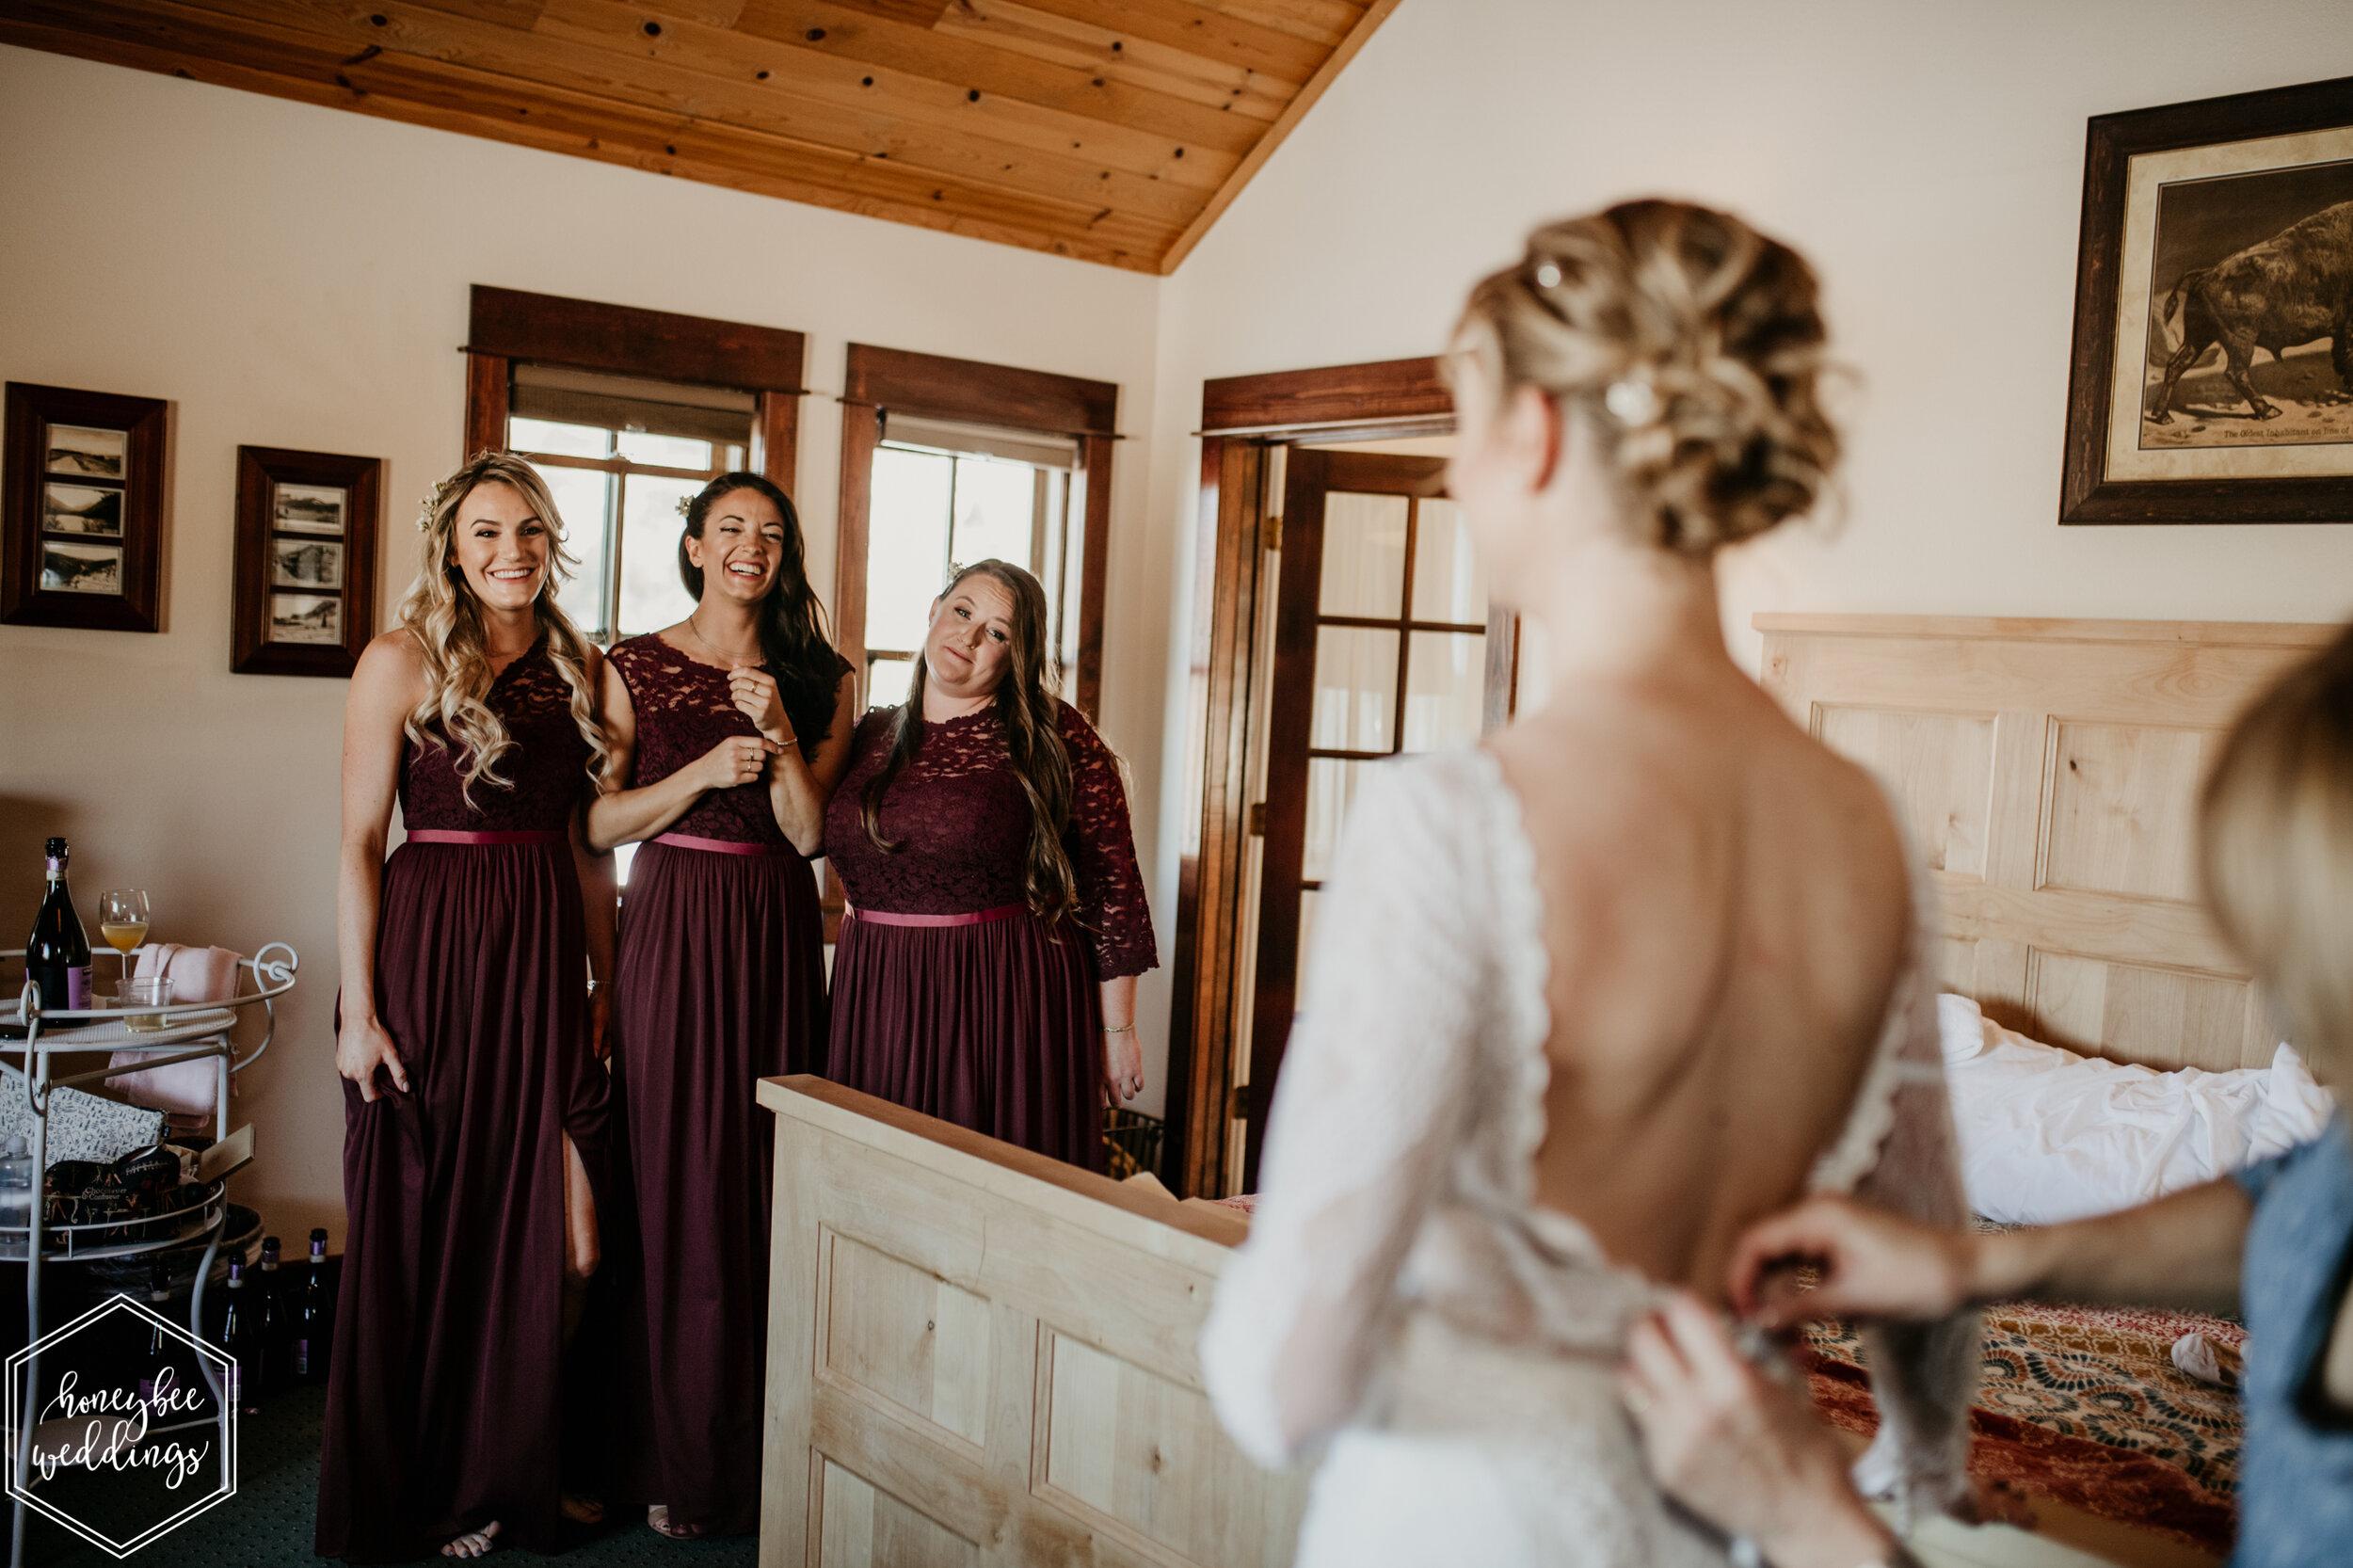 029Chico Hot Springs Wedding_Montana Wedding Photographer_Winter Wedding_Ariel & Richard_October 12, 2019-1053.jpg